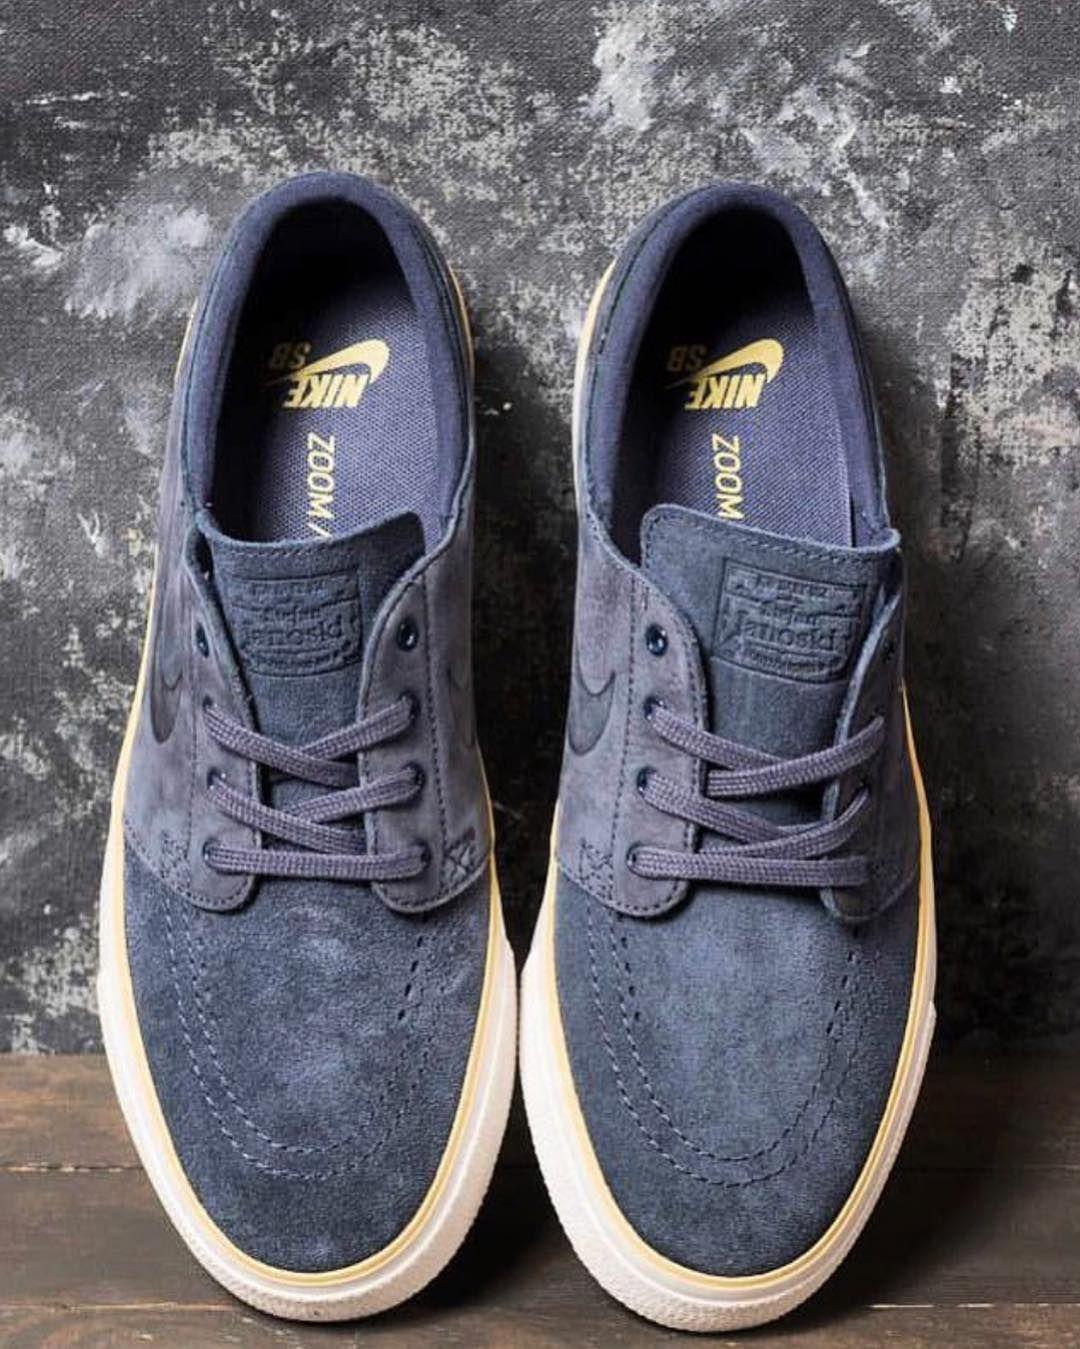 5c045fc28c Converse Chuck Taylor · Vans Authentic · Nike Shoes · Kicks · Janoski Jordan  3